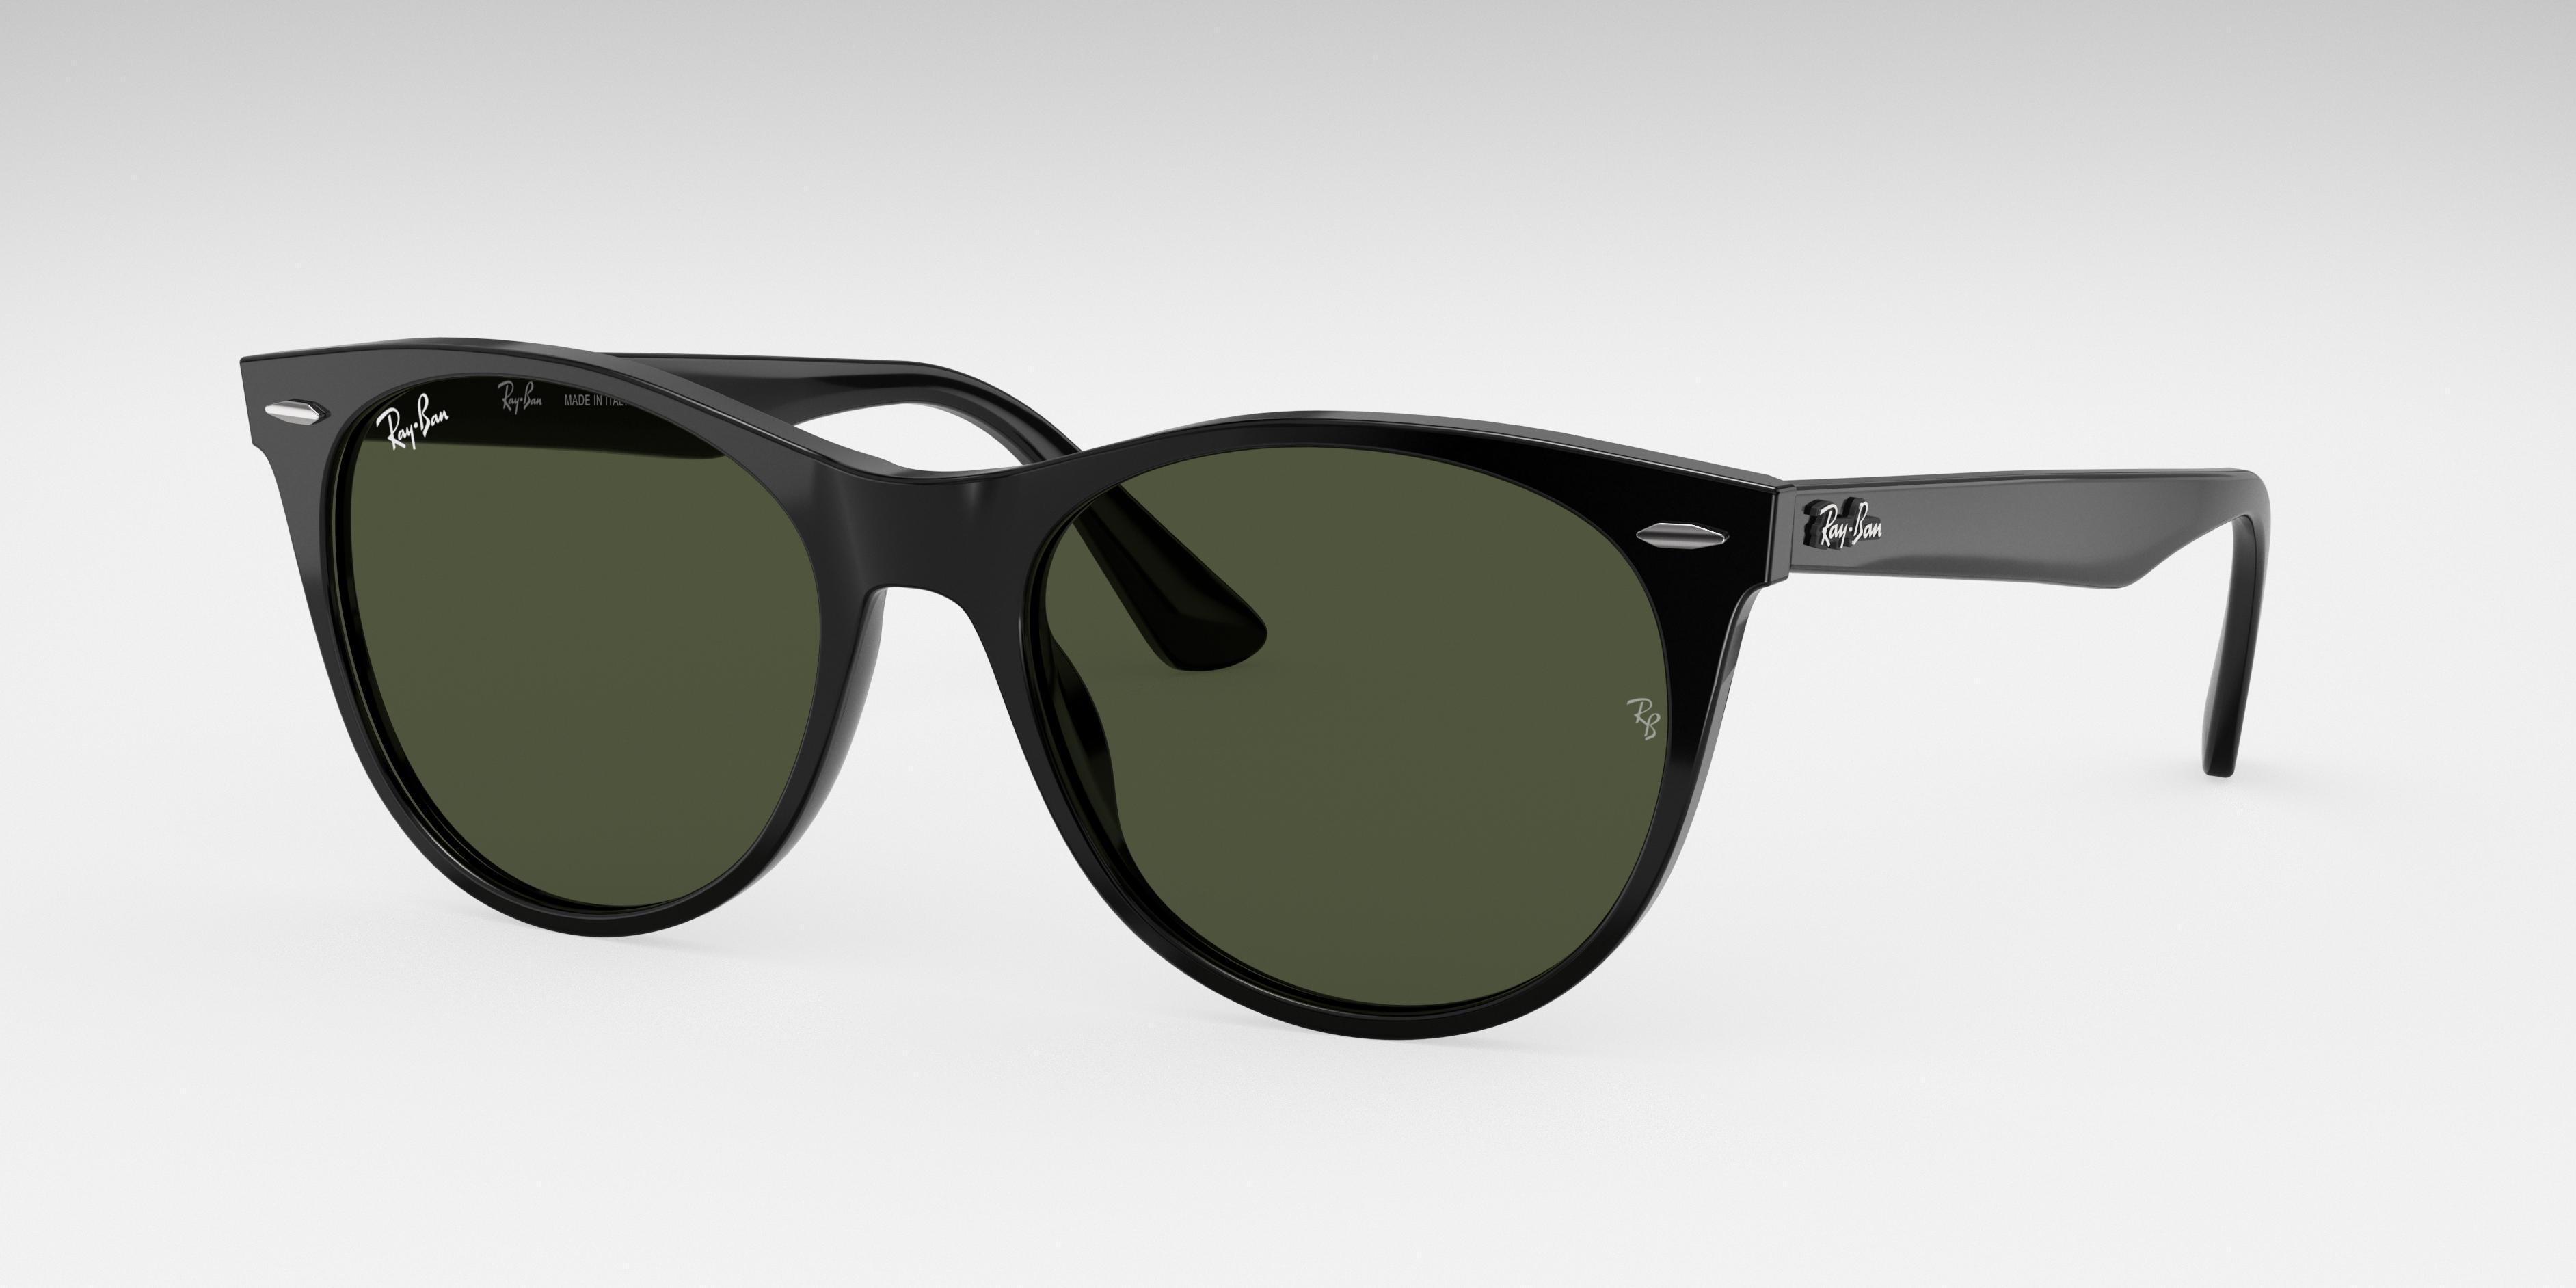 Ray-Ban Wayfarer II Classic Black, Green Lenses - RB2185